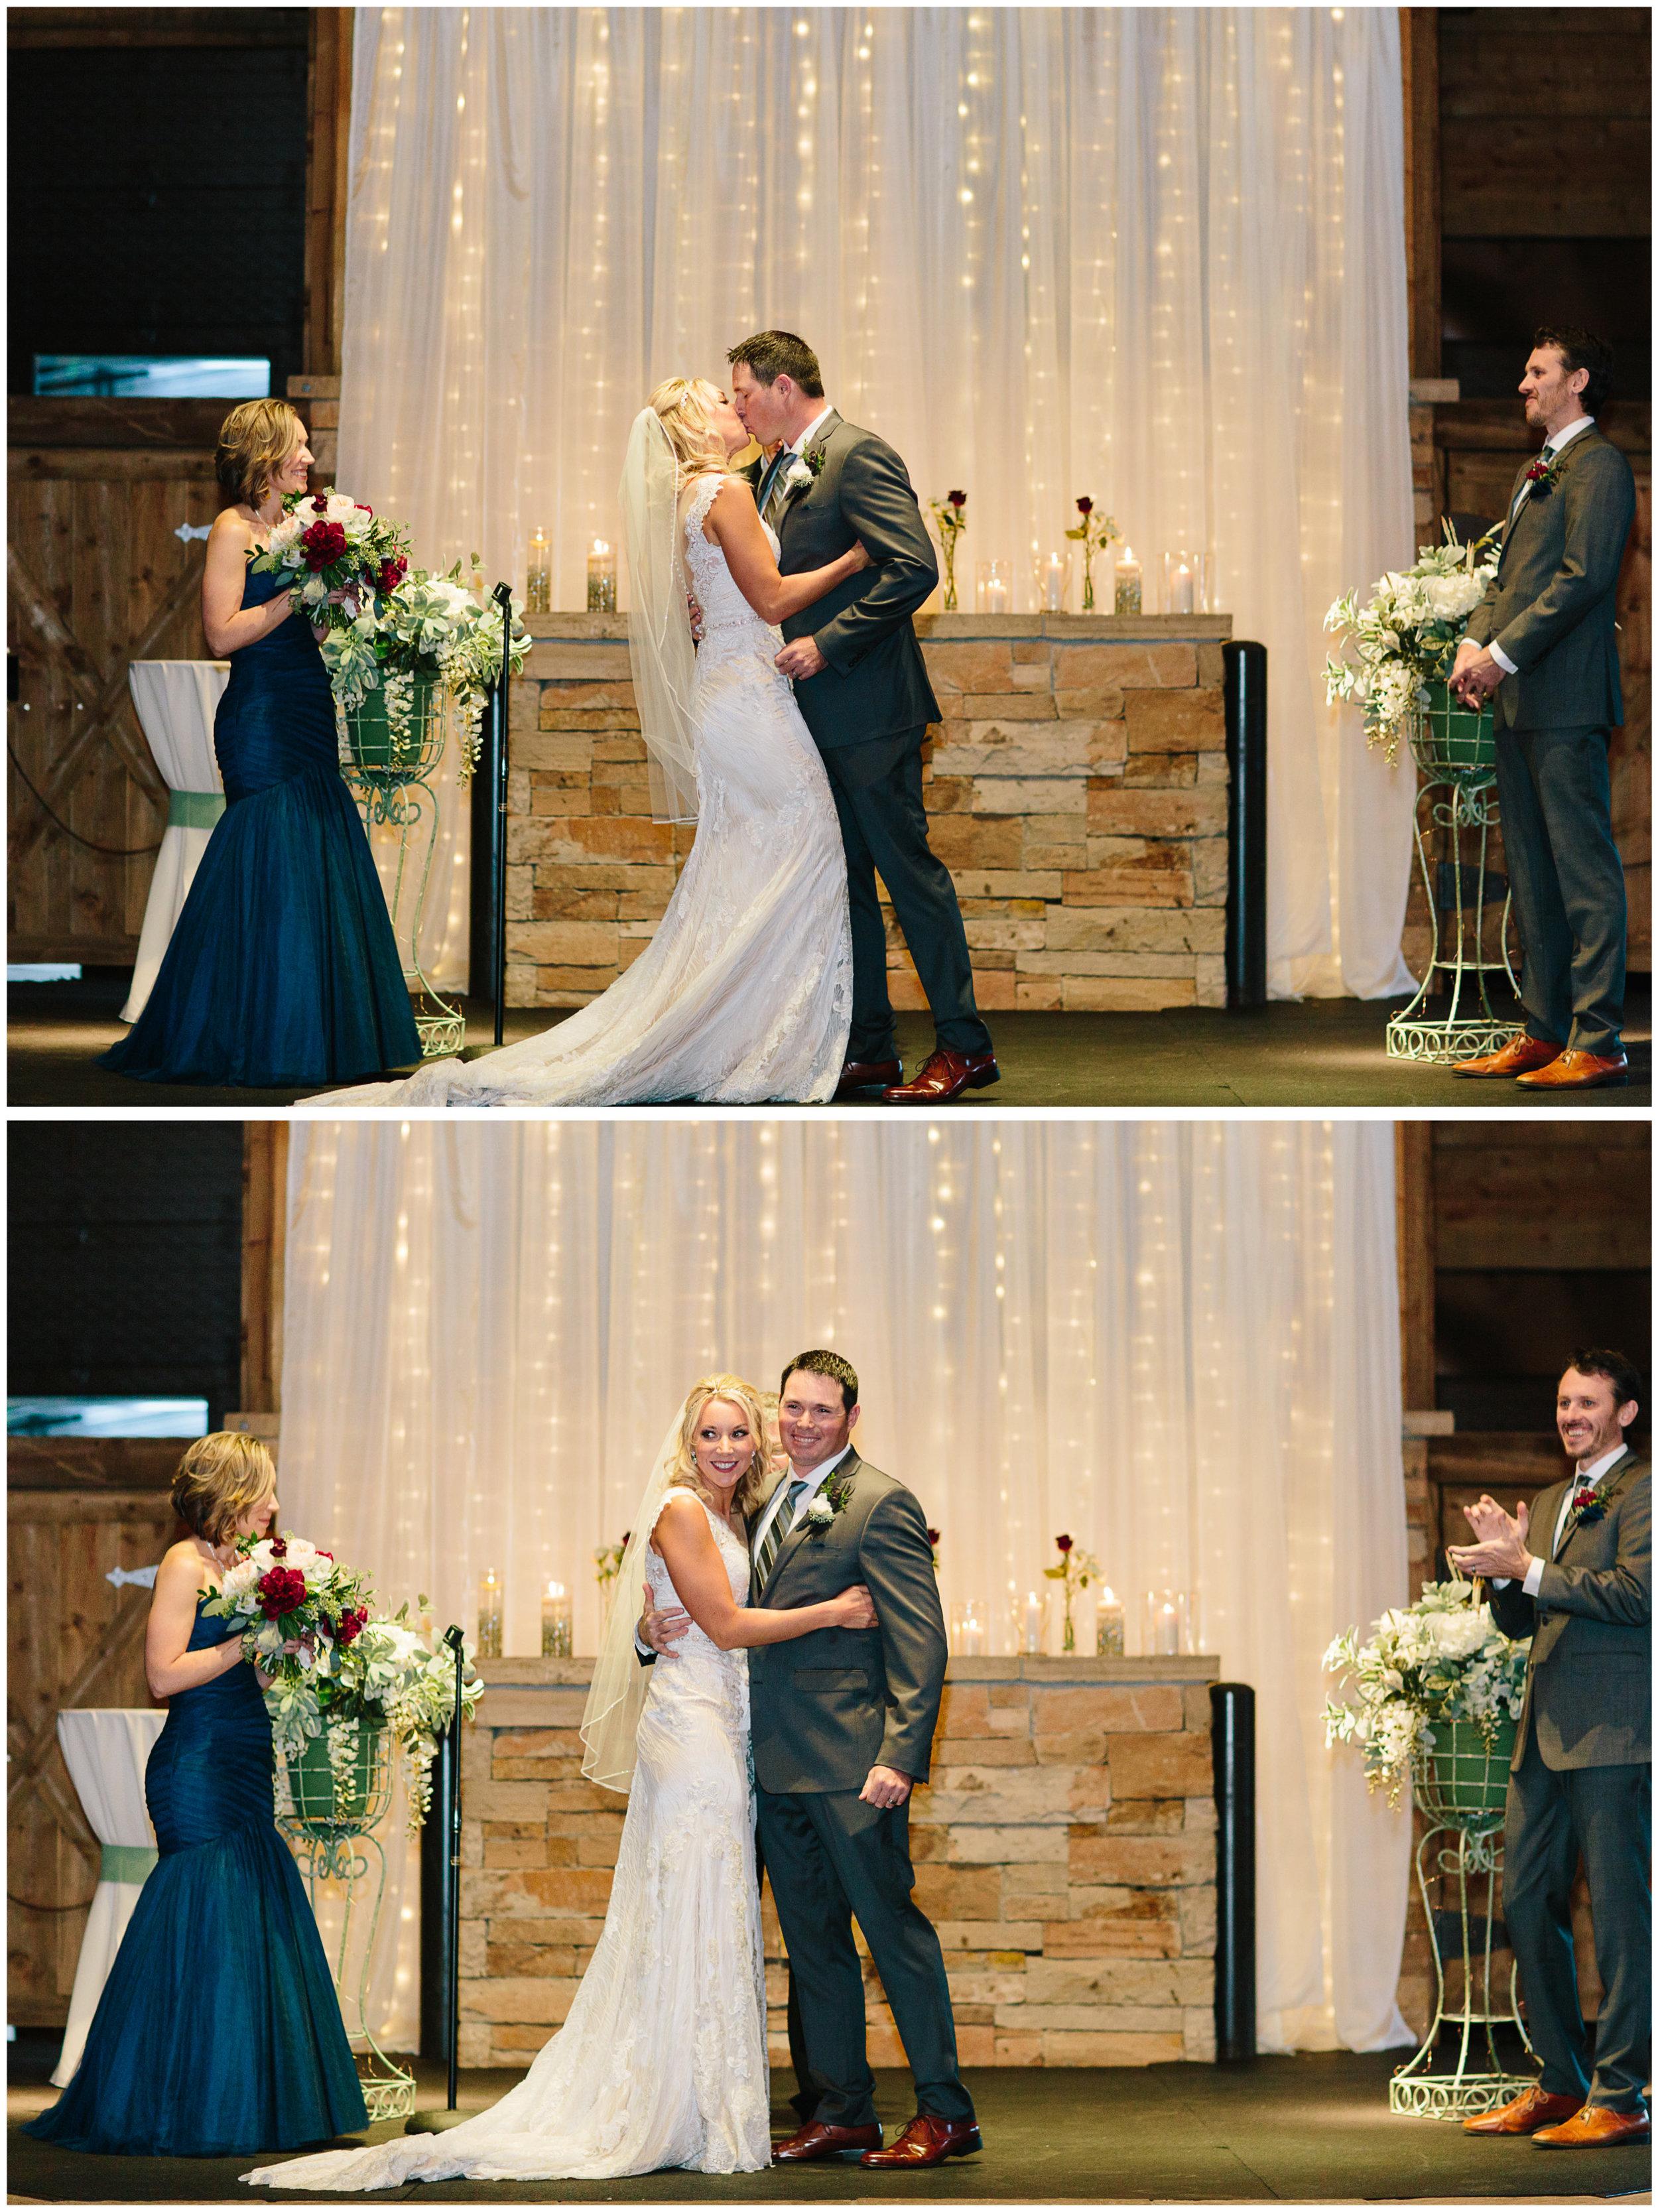 spruce_mountain_ranch_wedding_49.jpg